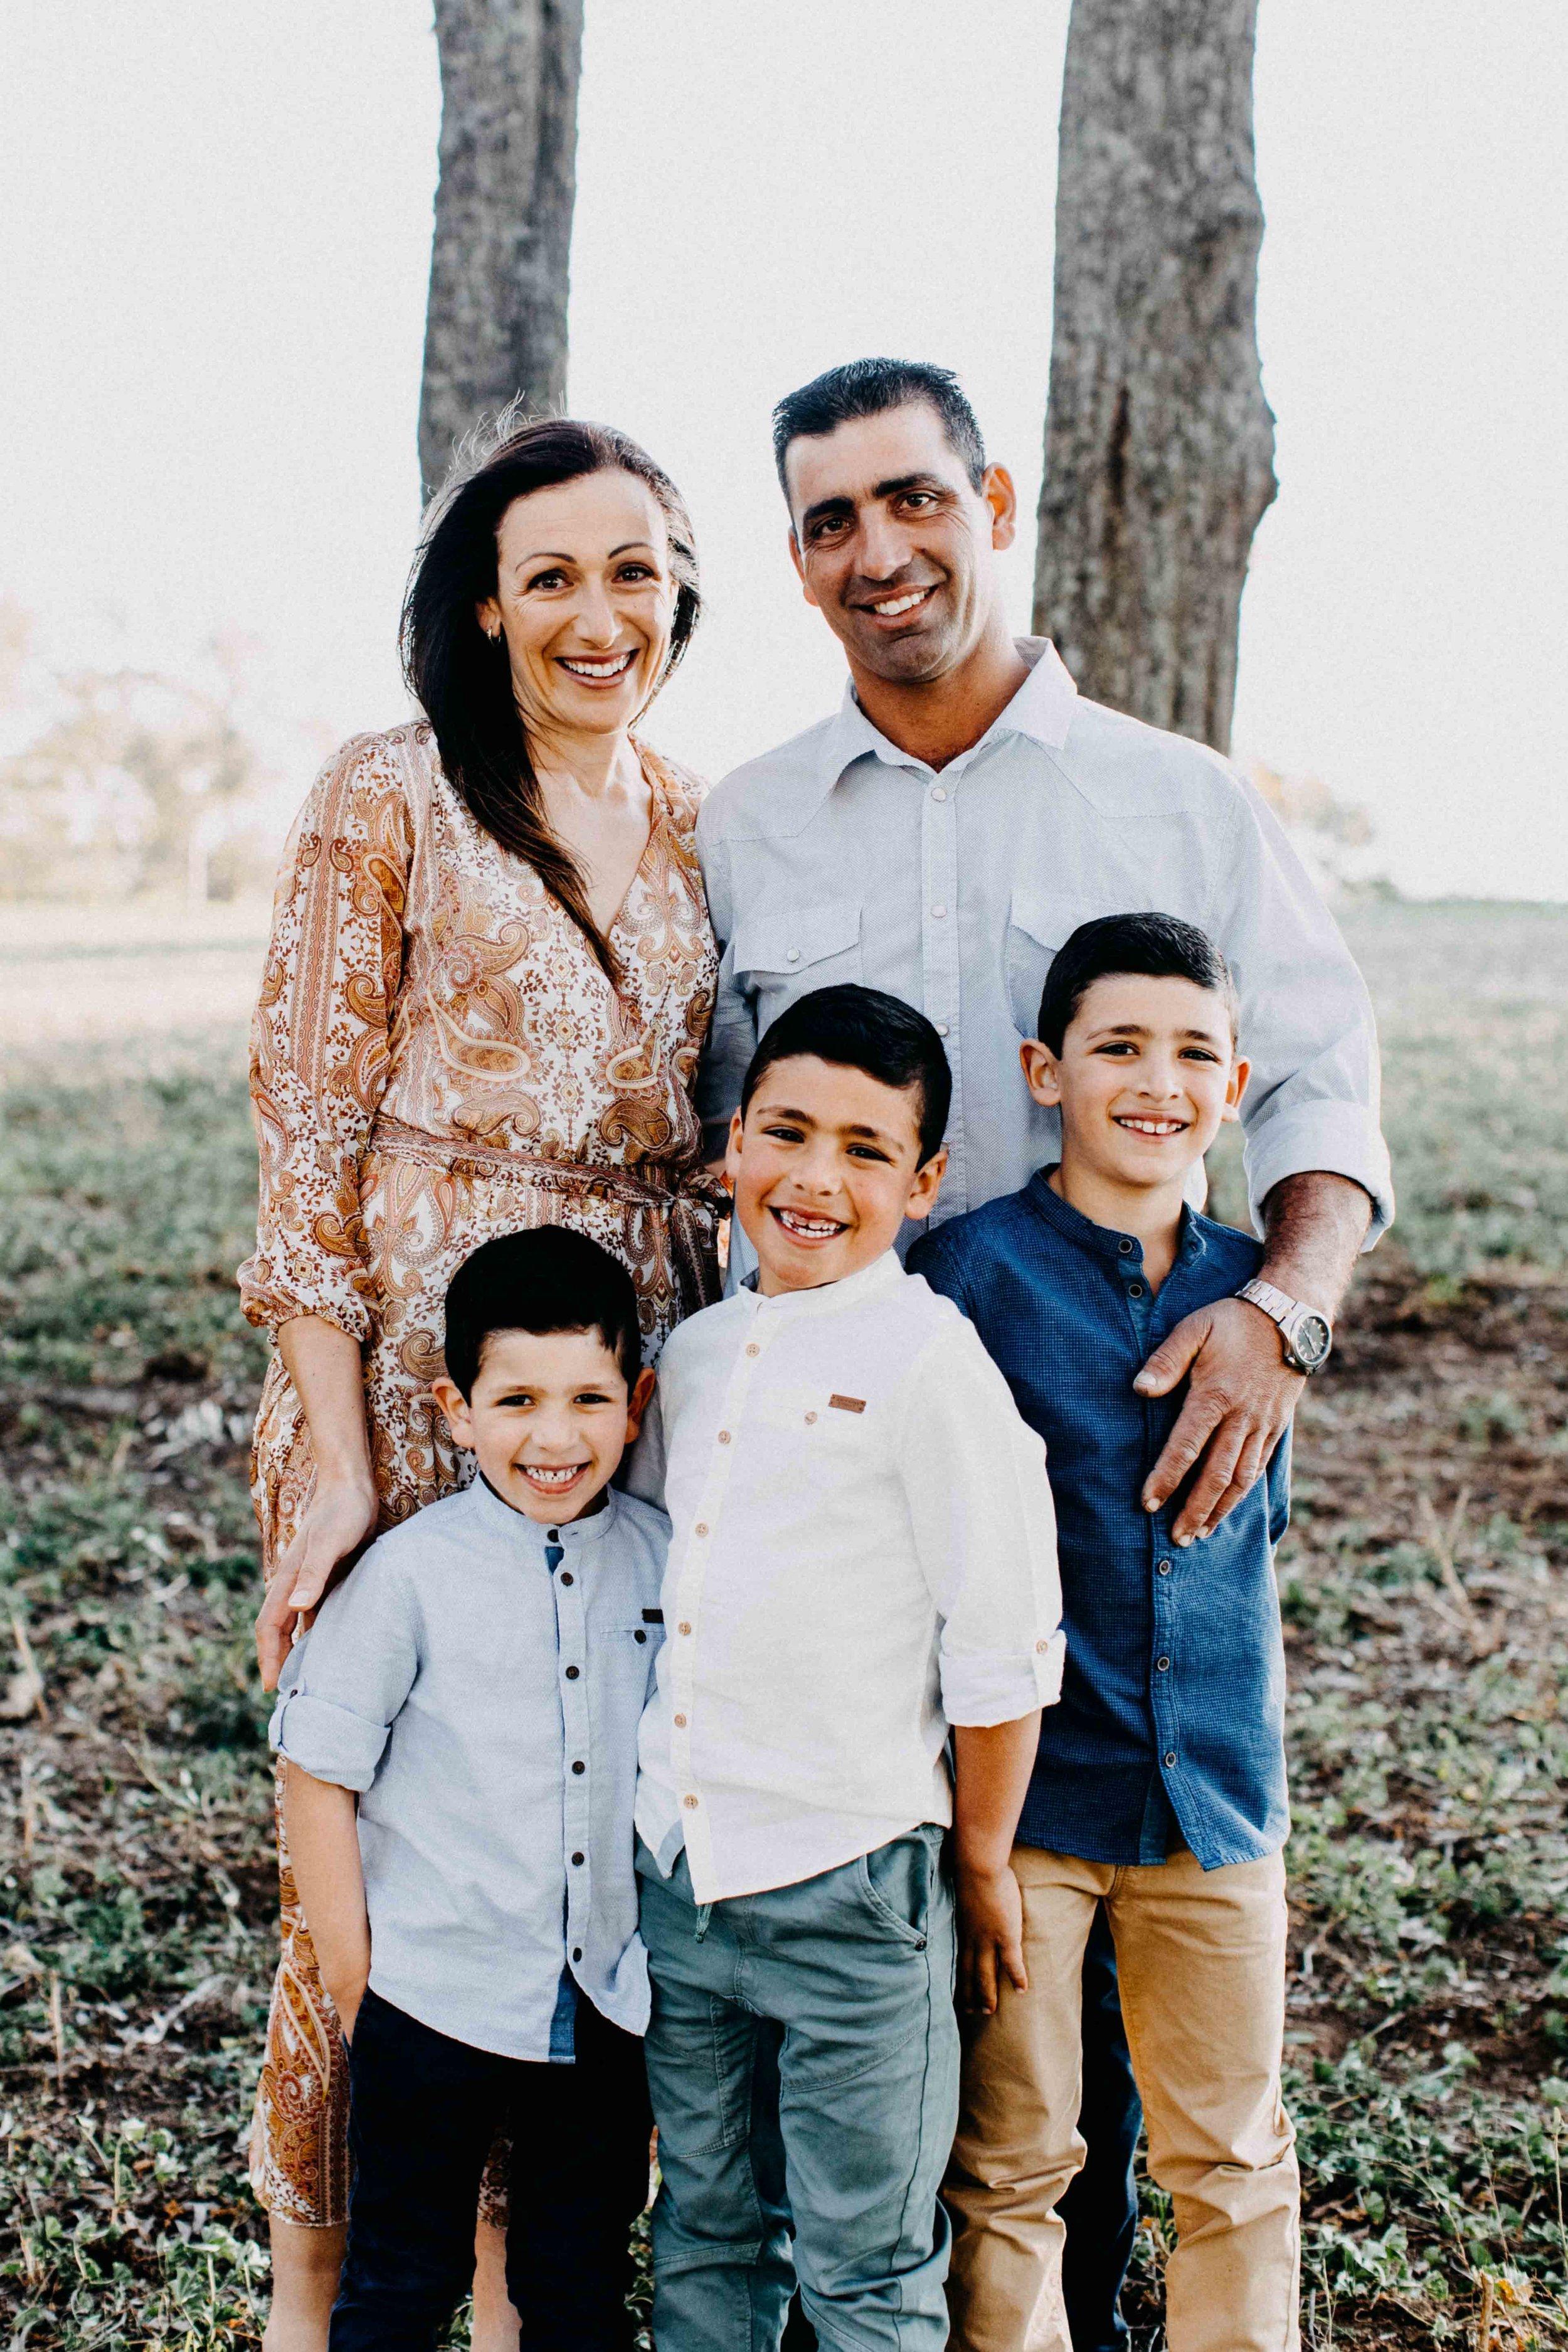 camden-family-photography-galea-www.emilyobrienphotography.net-5.jpg